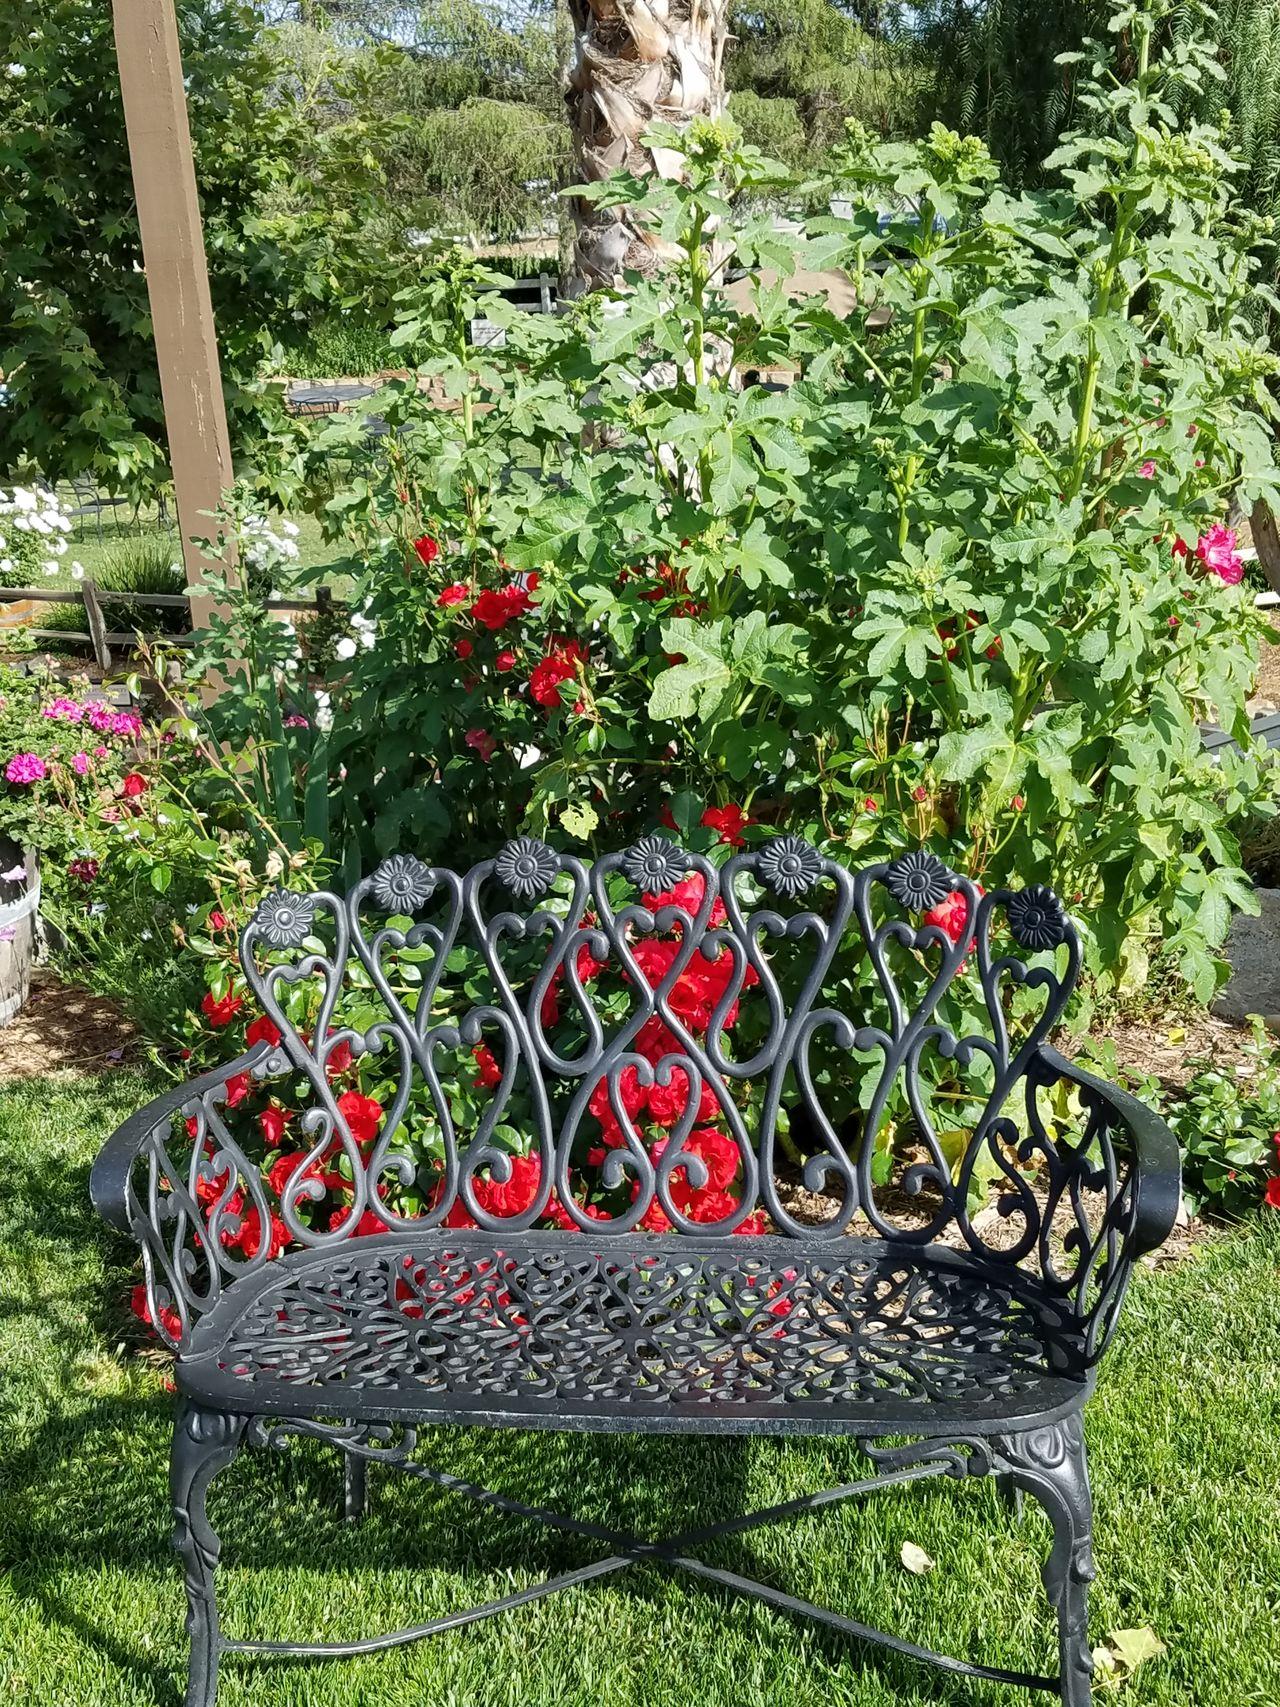 Garden Flowers Benchlovers Outdoors❤ Sunlight Flower Garden Nature Grass No People Sunlight Colorful Flowers